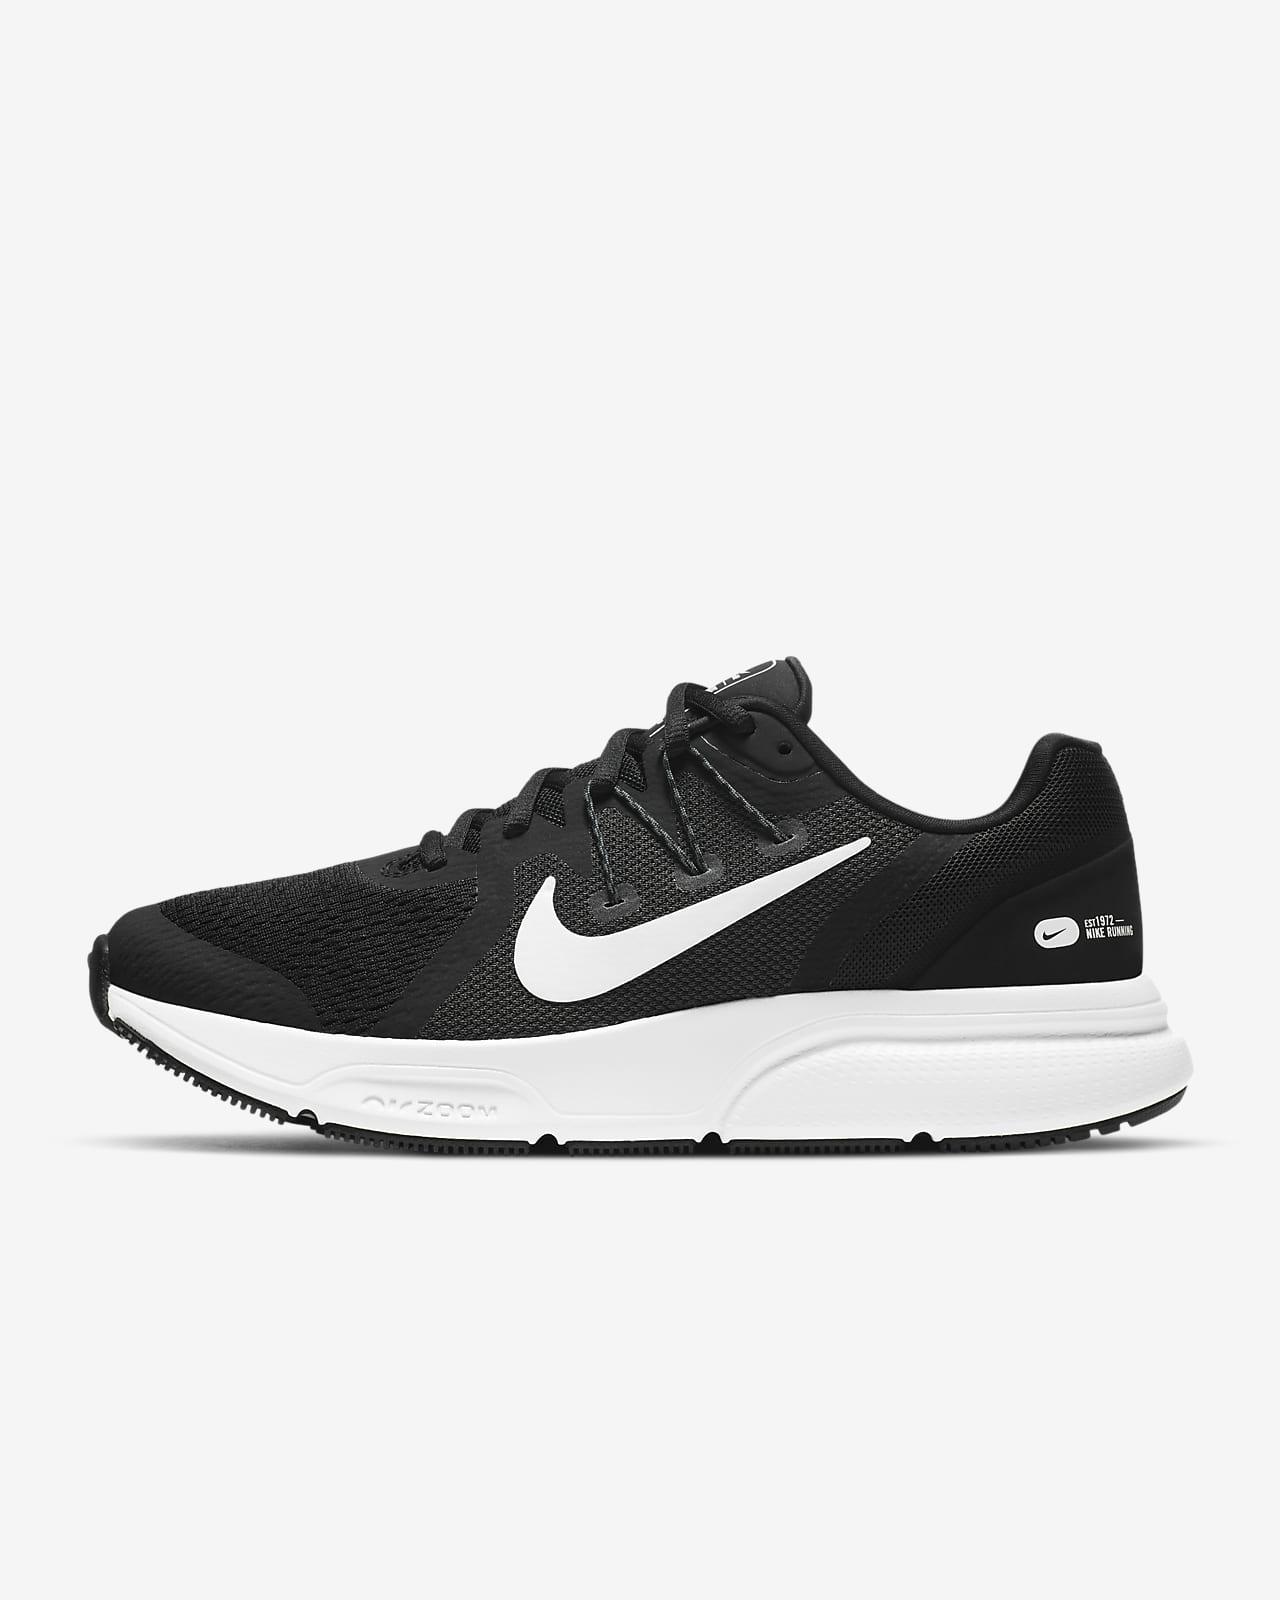 Nike Zoom Span 3 Women's Road Running Shoes